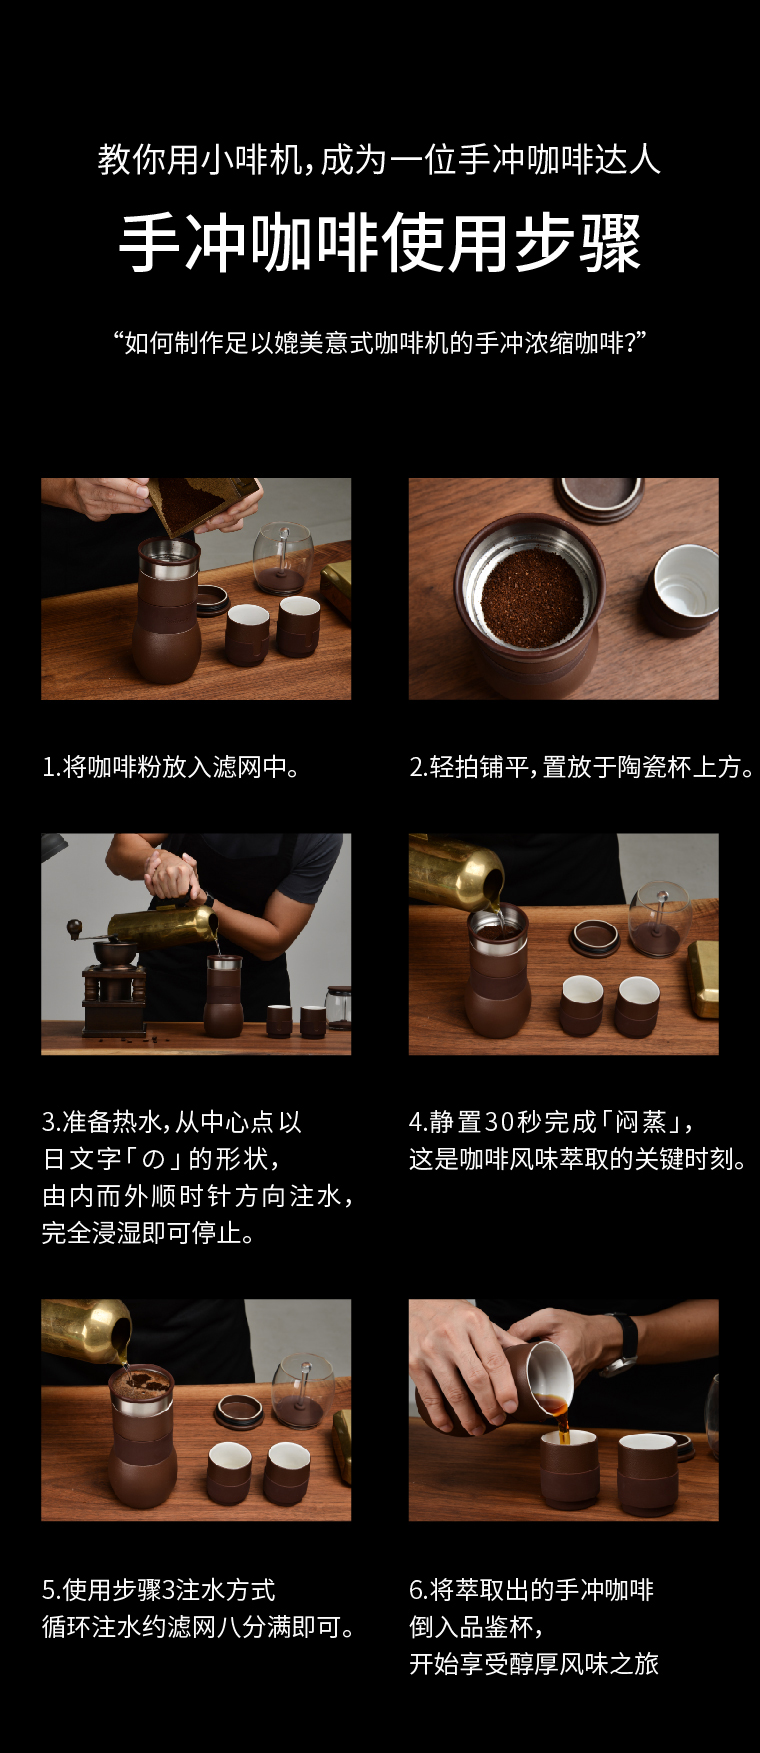 小啡机7-01.jpg